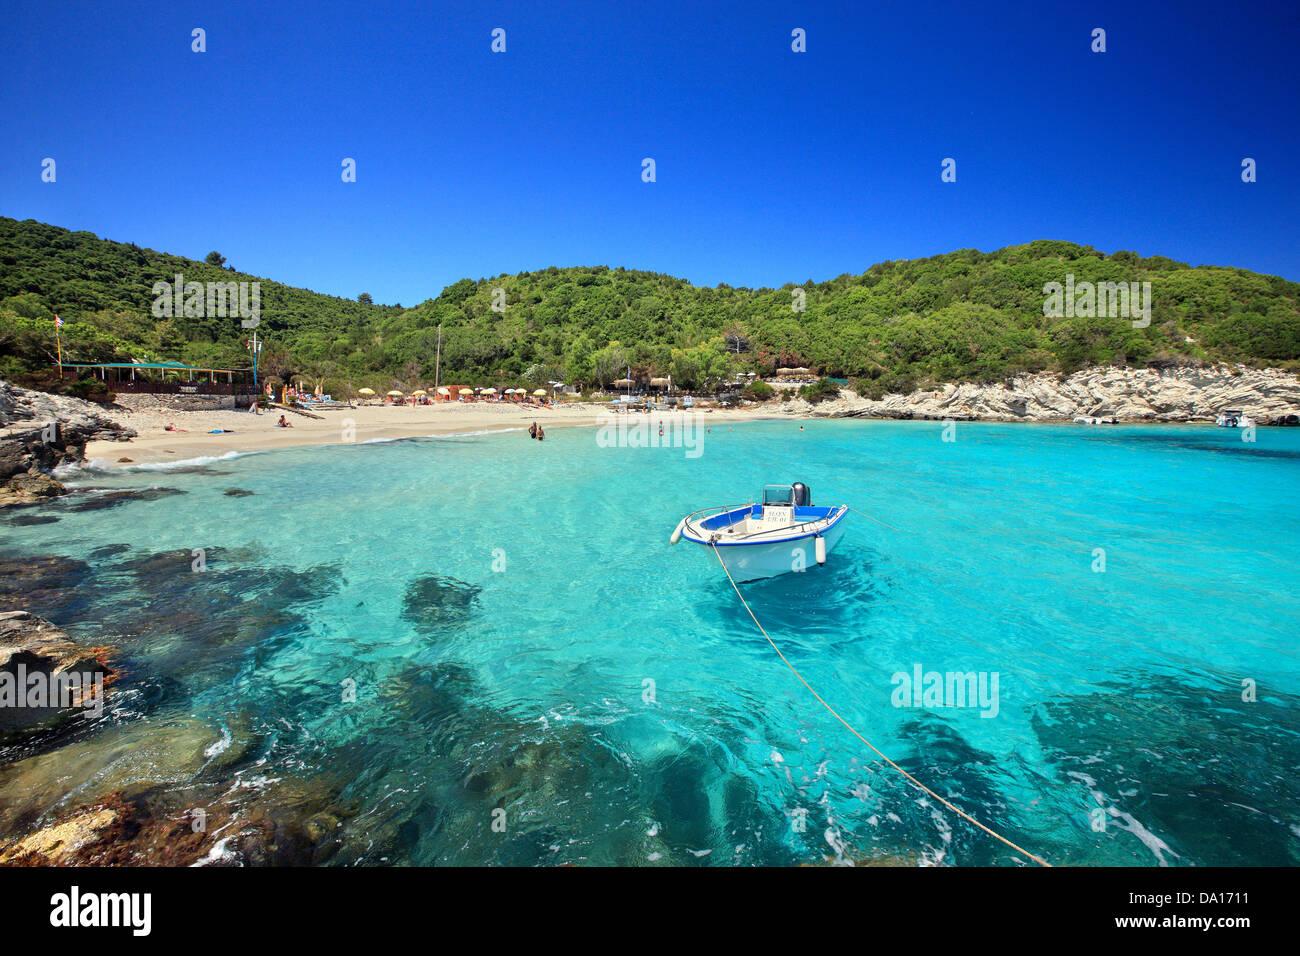 The exotic Vrika beach, Antipaxos ('Antipaxi') island, Ionian Sea, Eptanisa ('Seven Islands'), Greece. - Stock Image